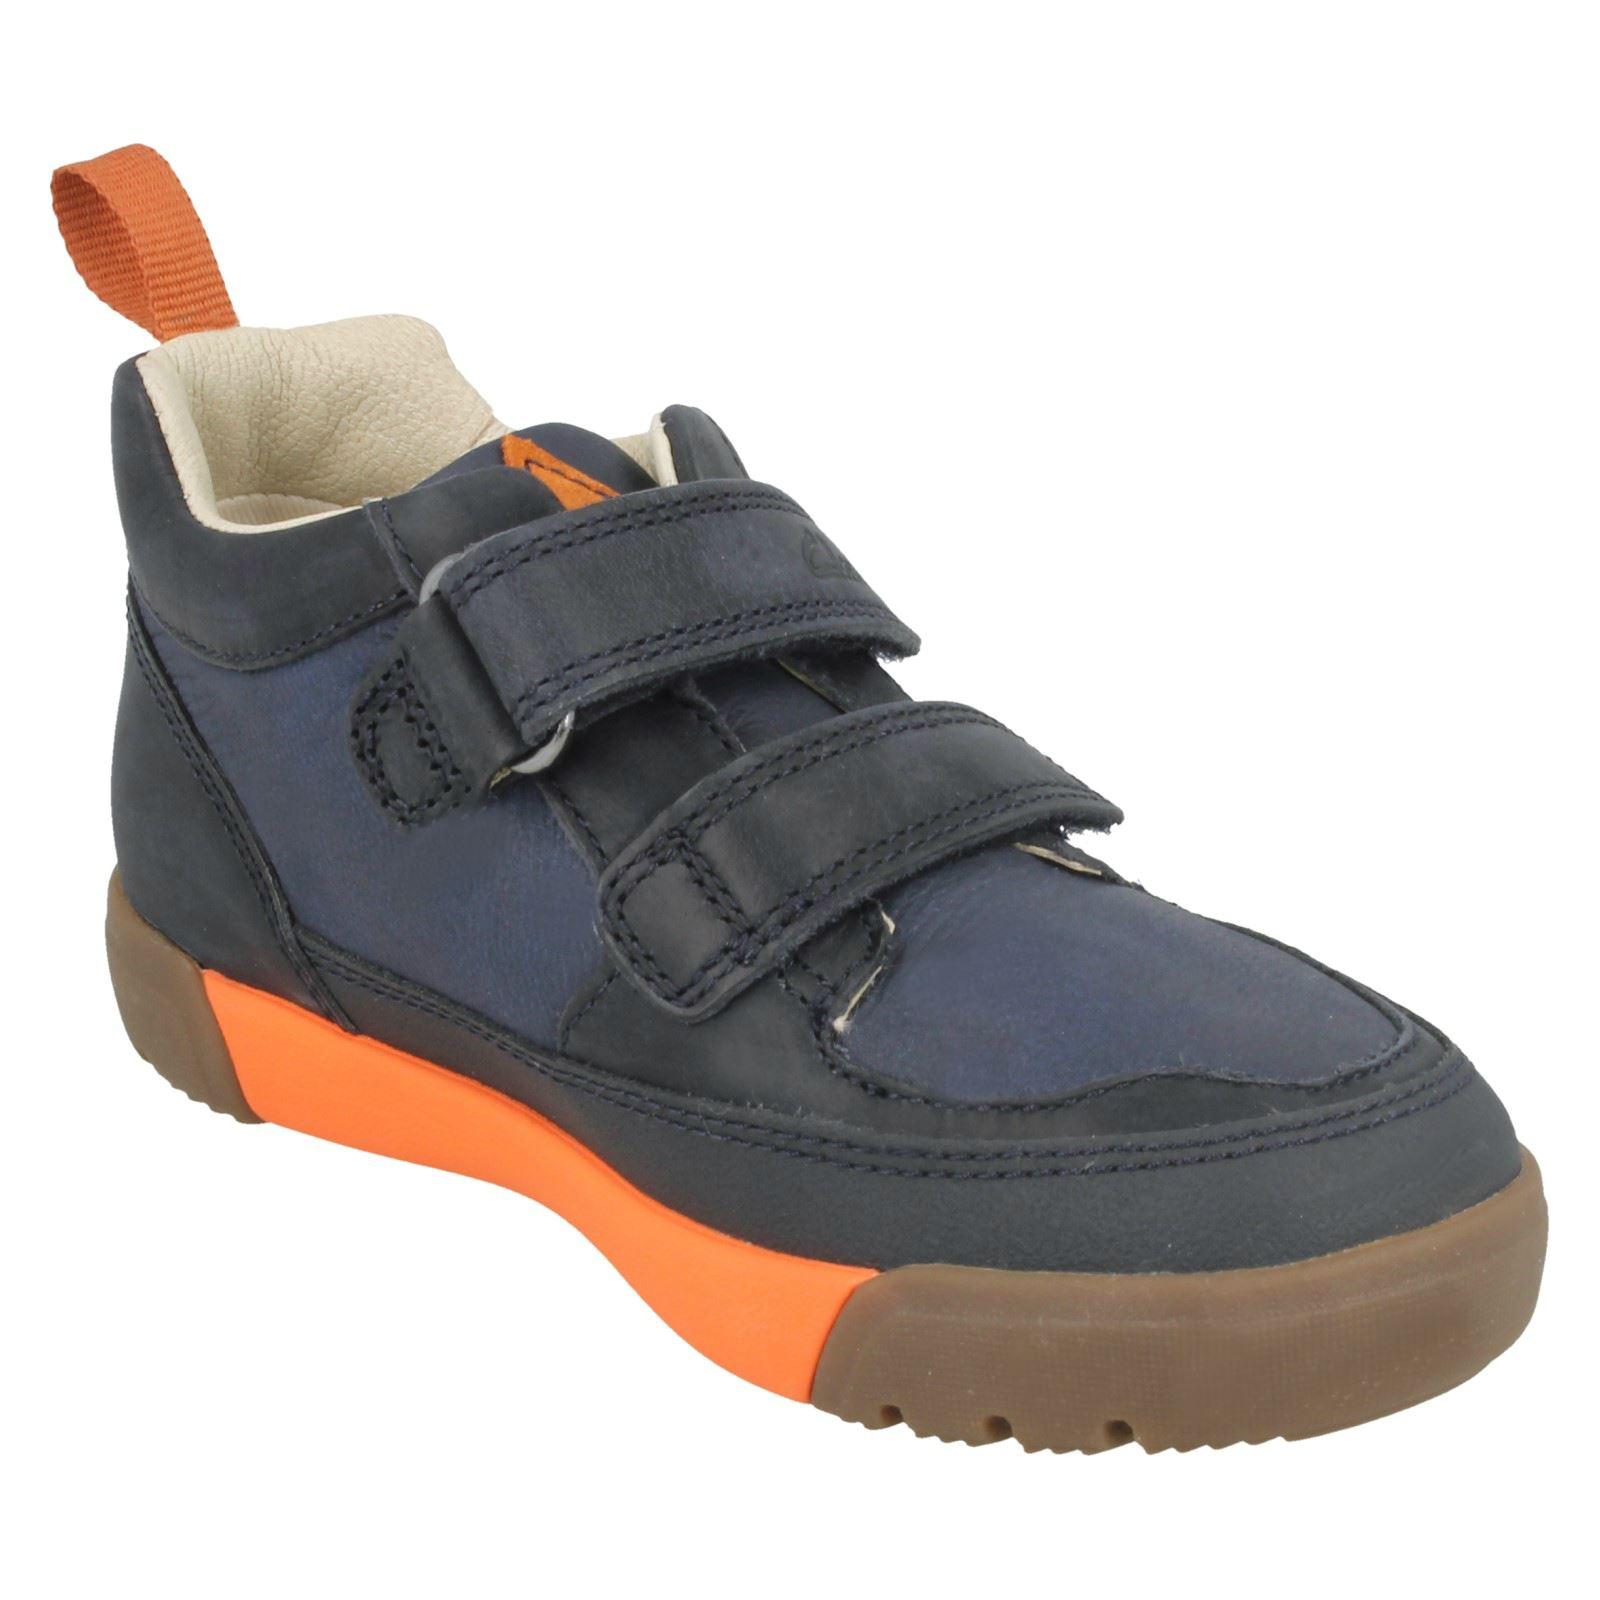 Clarks-Muchachos-Informales-Zapatillas-Lil-Folk-Salto